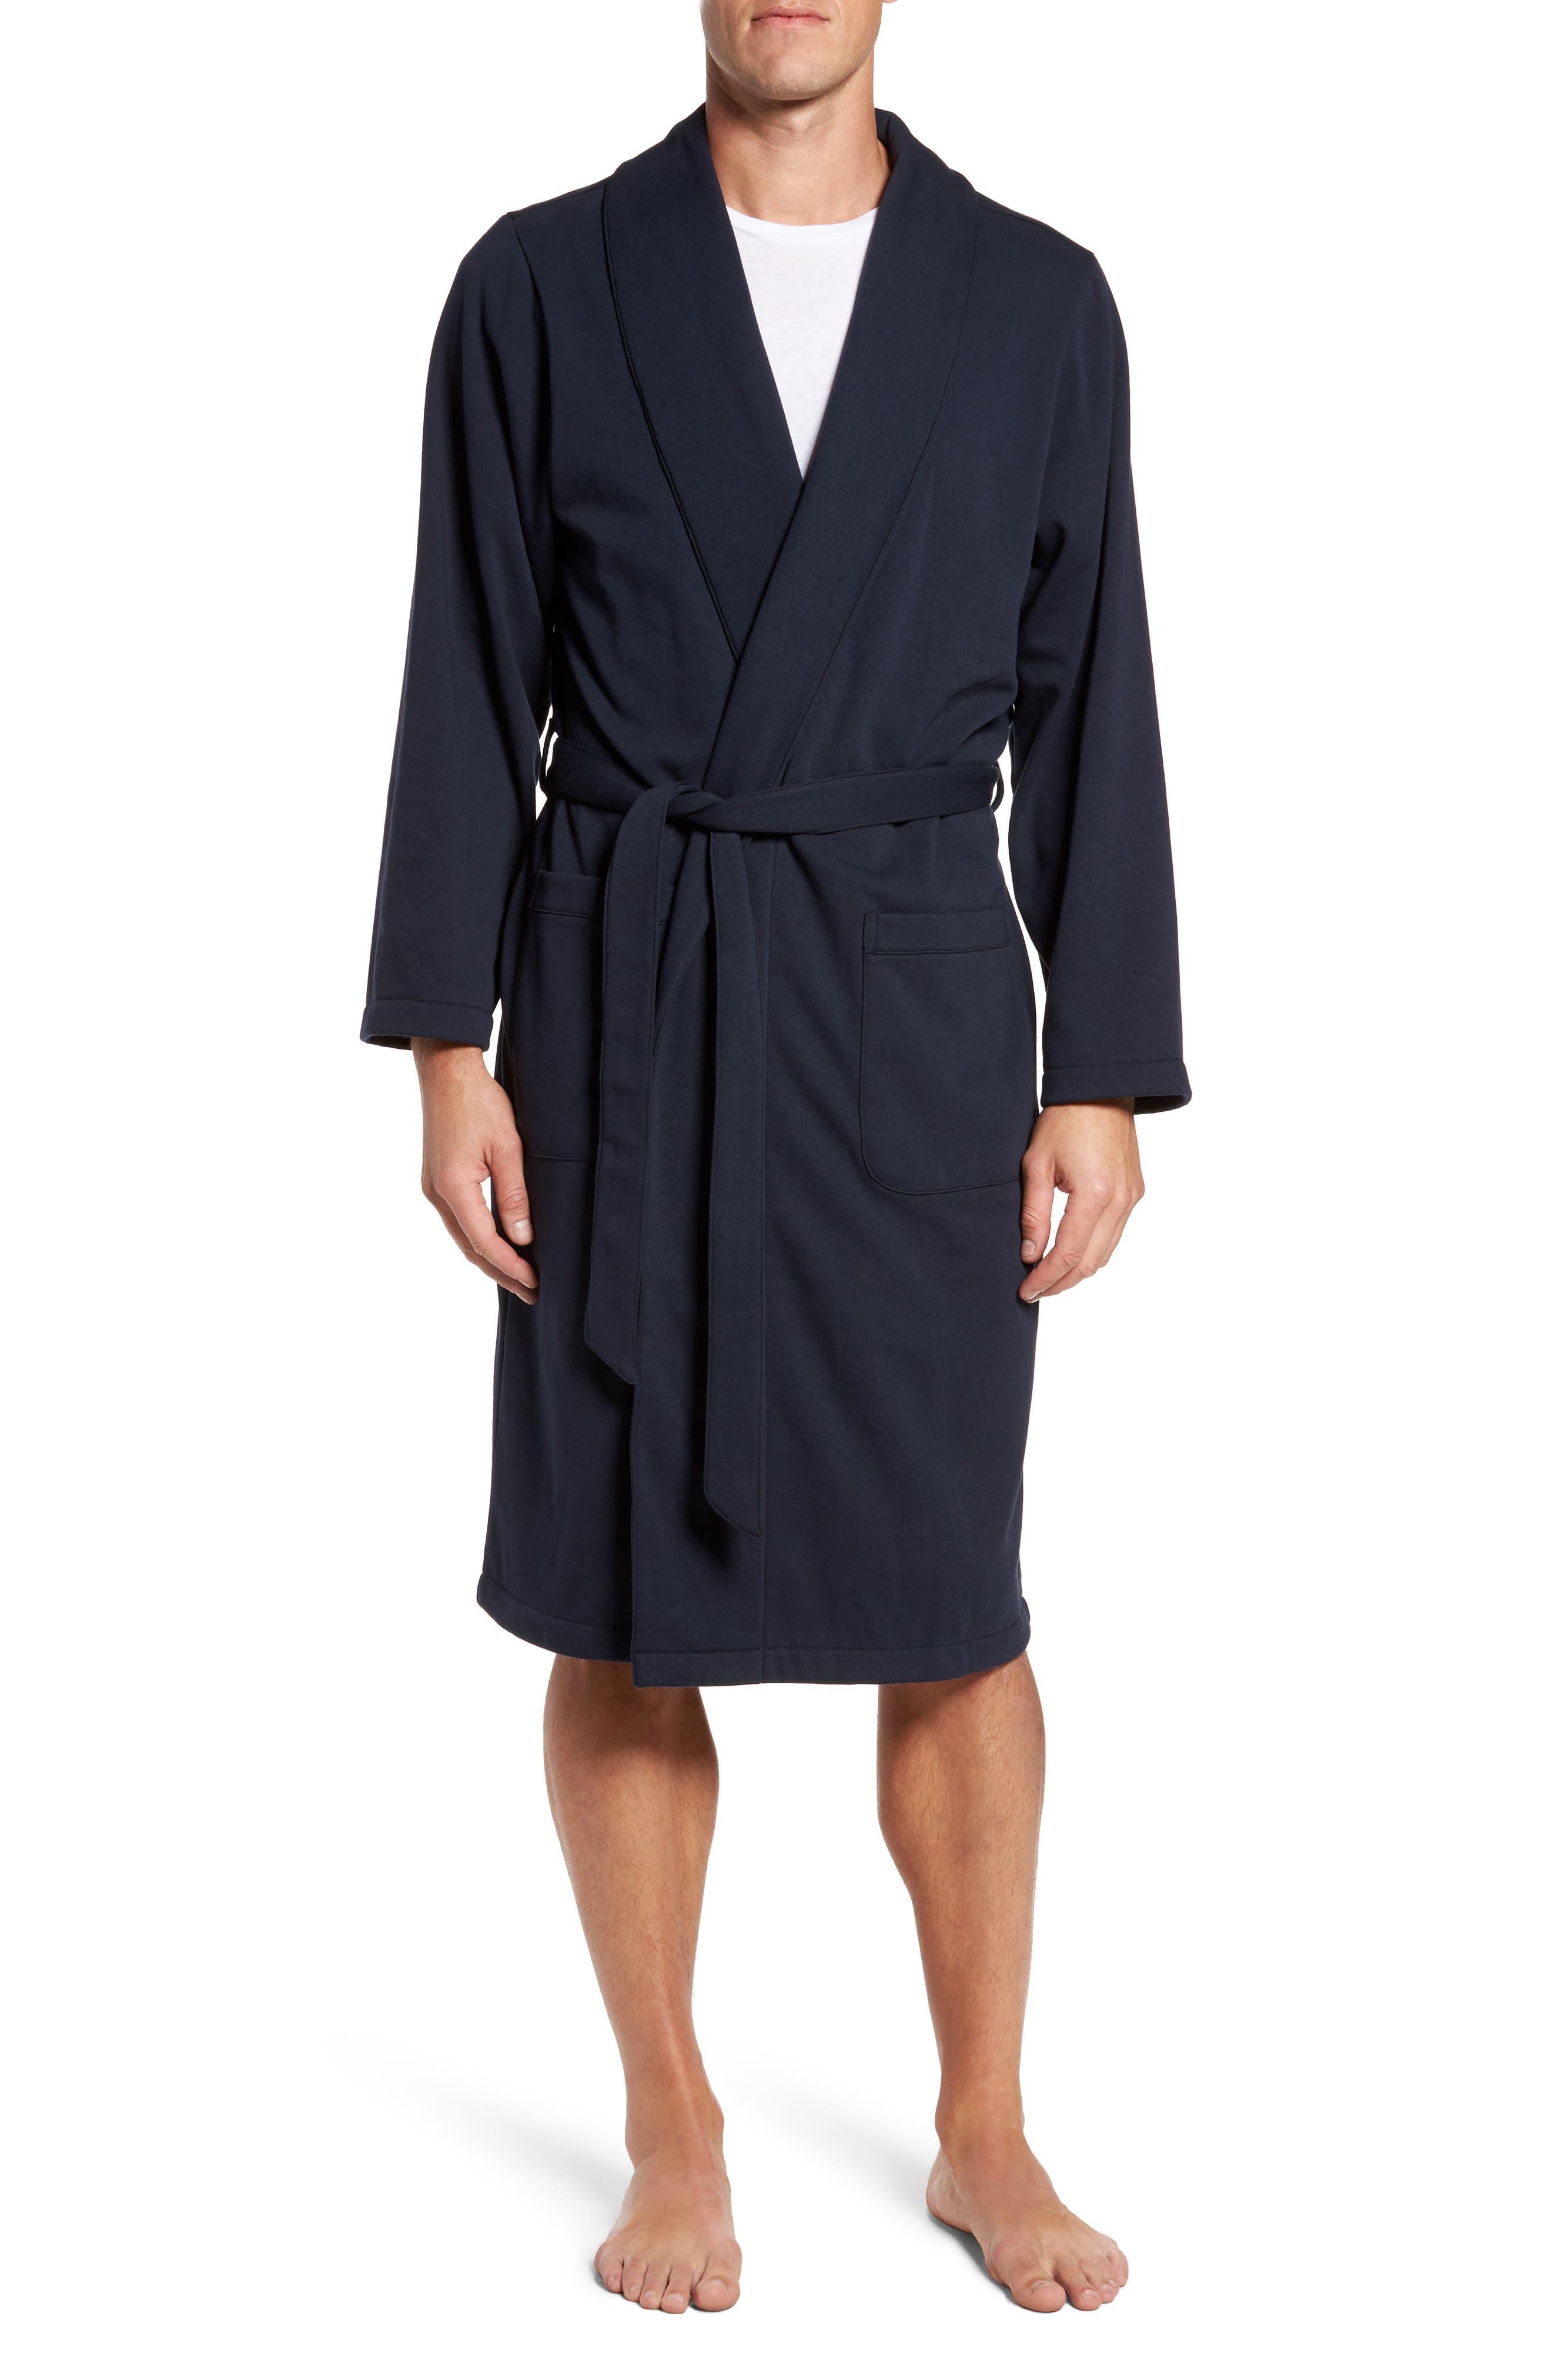 Alternate Image 1 Selected - Nordstrom Men's Shop Jersey Fleece Robe